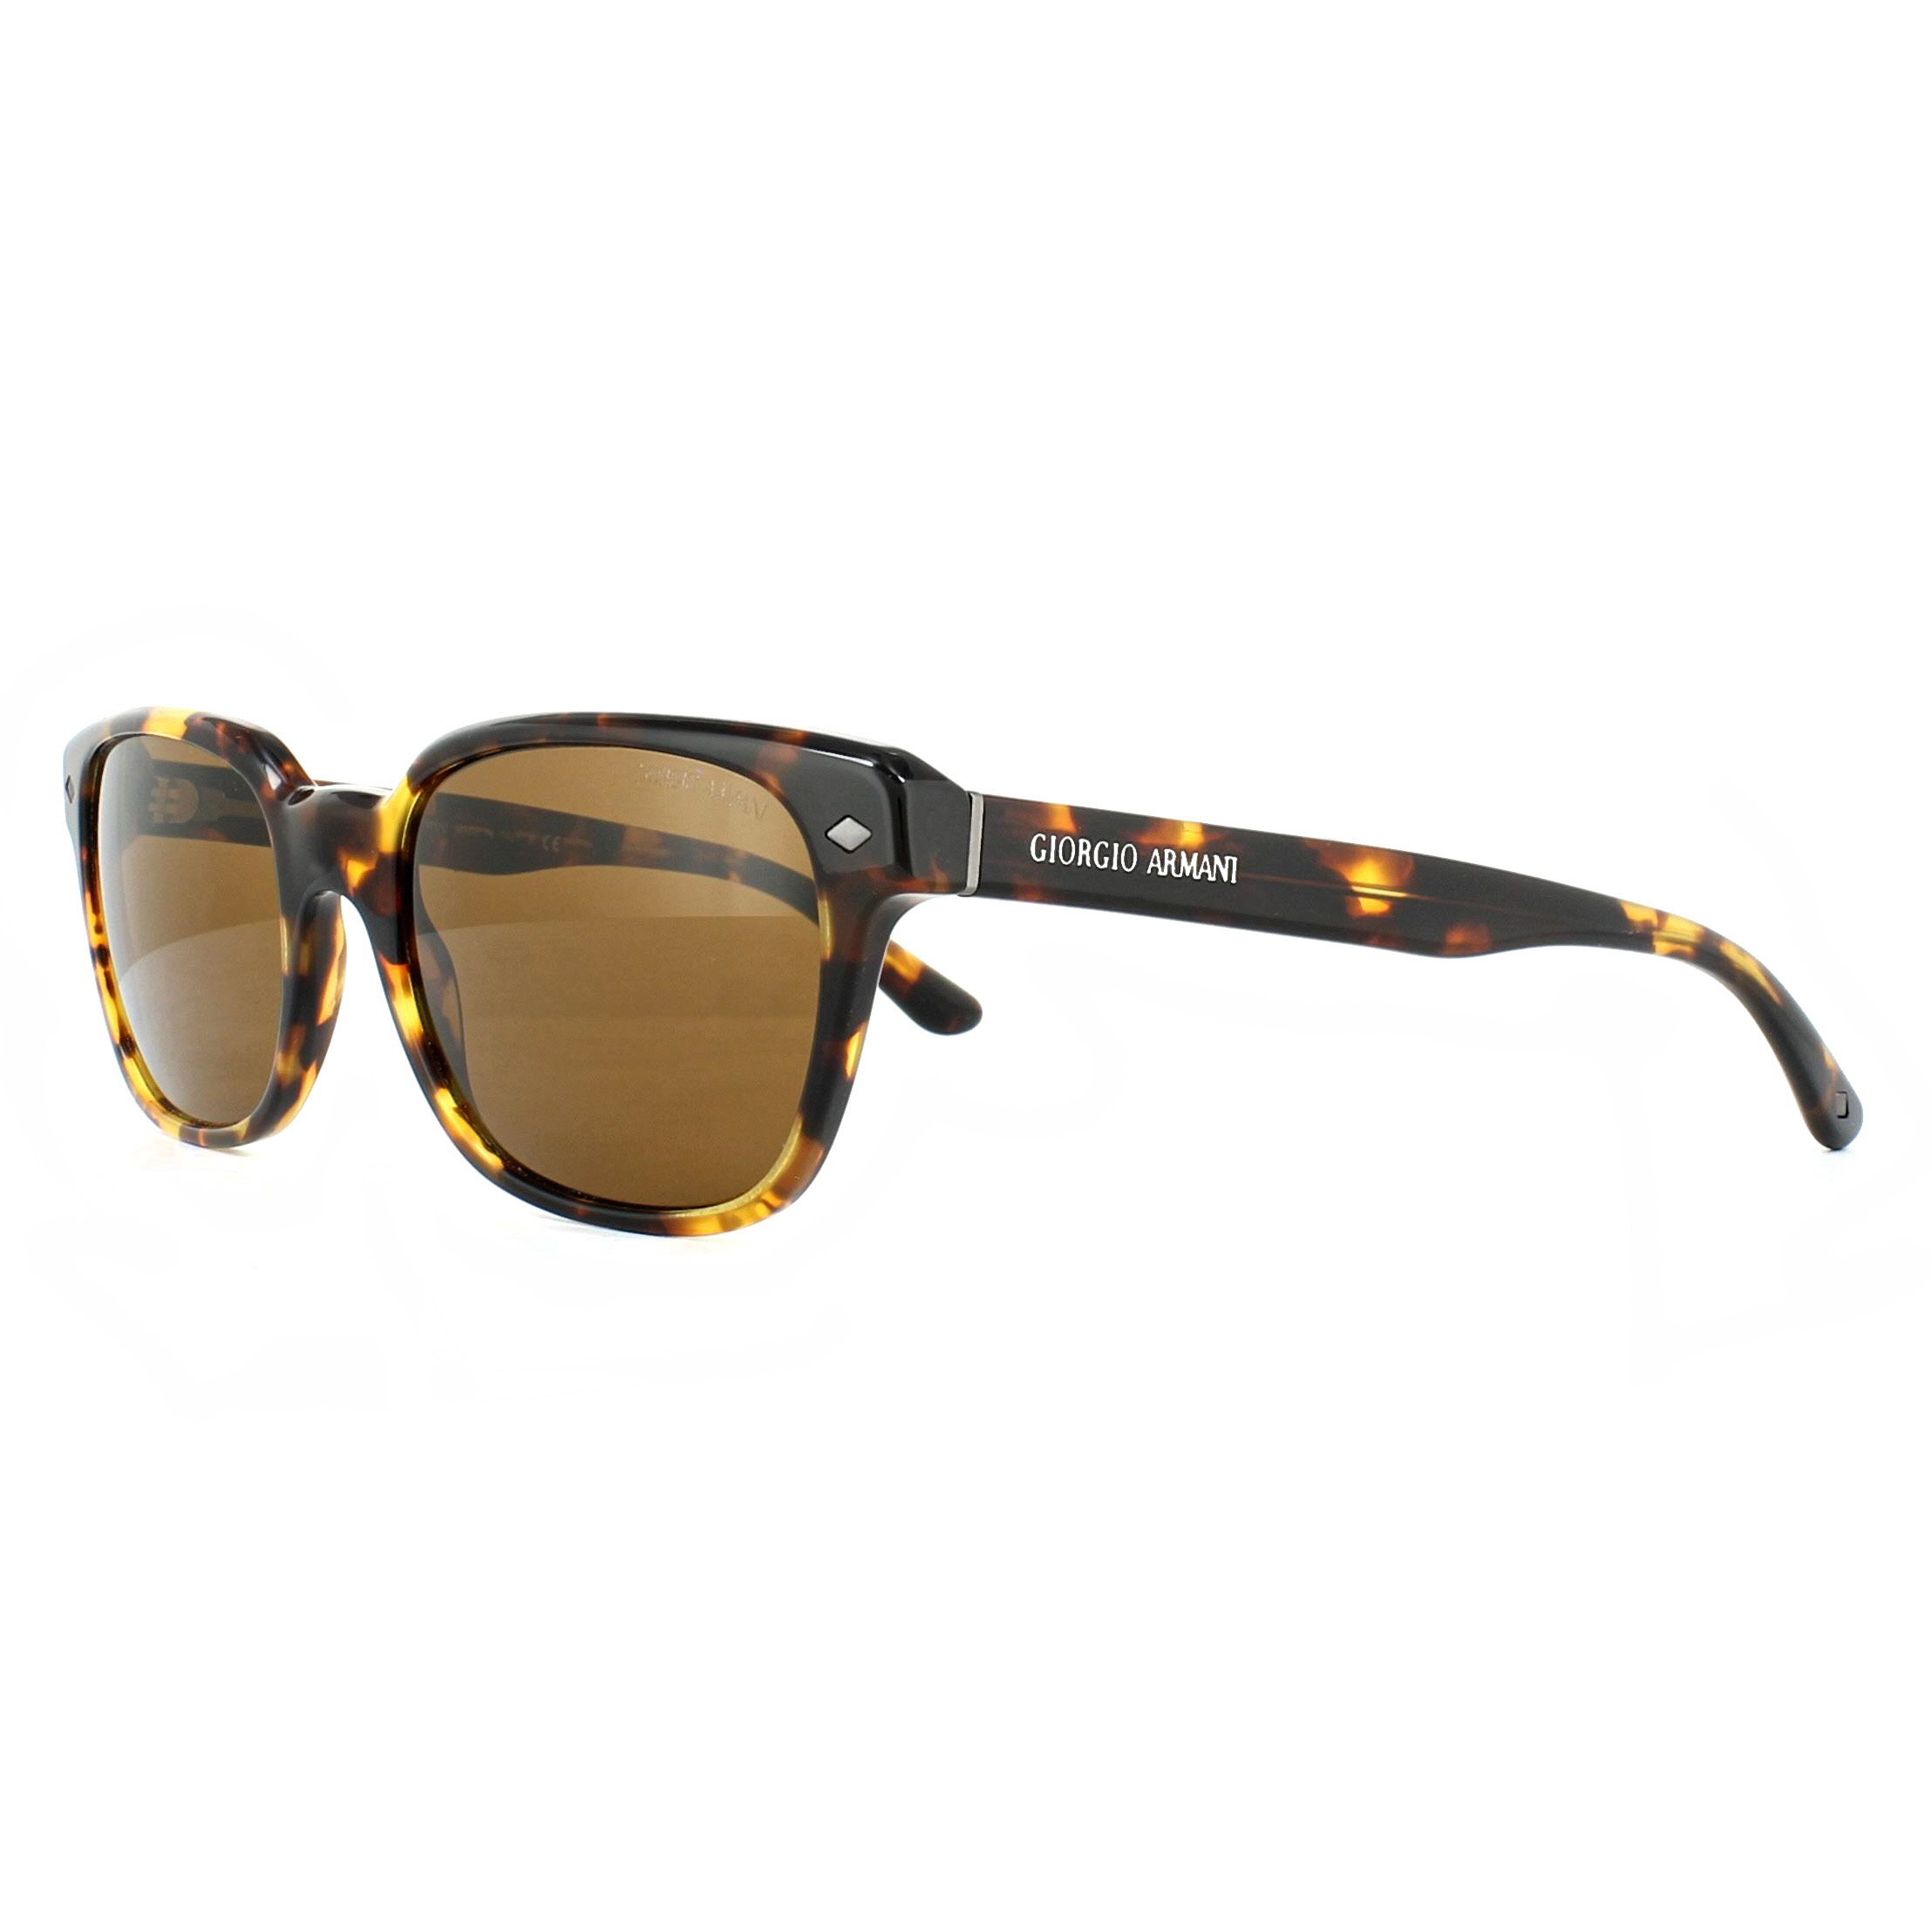 86940cb2a3fb Details about Giorgio Armani Sunglasses AR8067 509253 Yellow Havana Brown